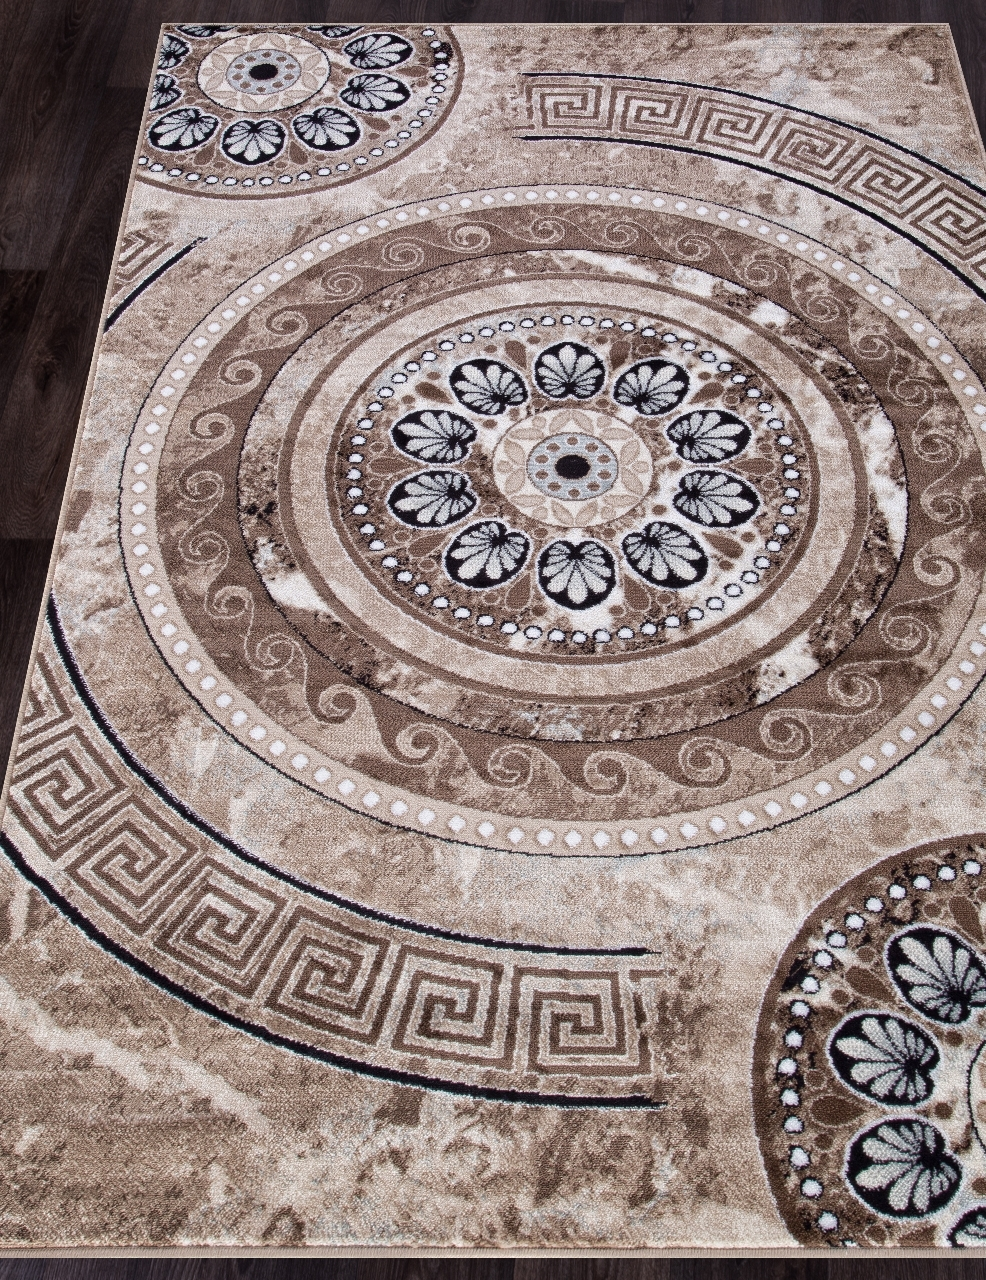 Ковер d300 - BROWN - Прямоугольник - коллекция VALENCIA DELUXE - фото 1